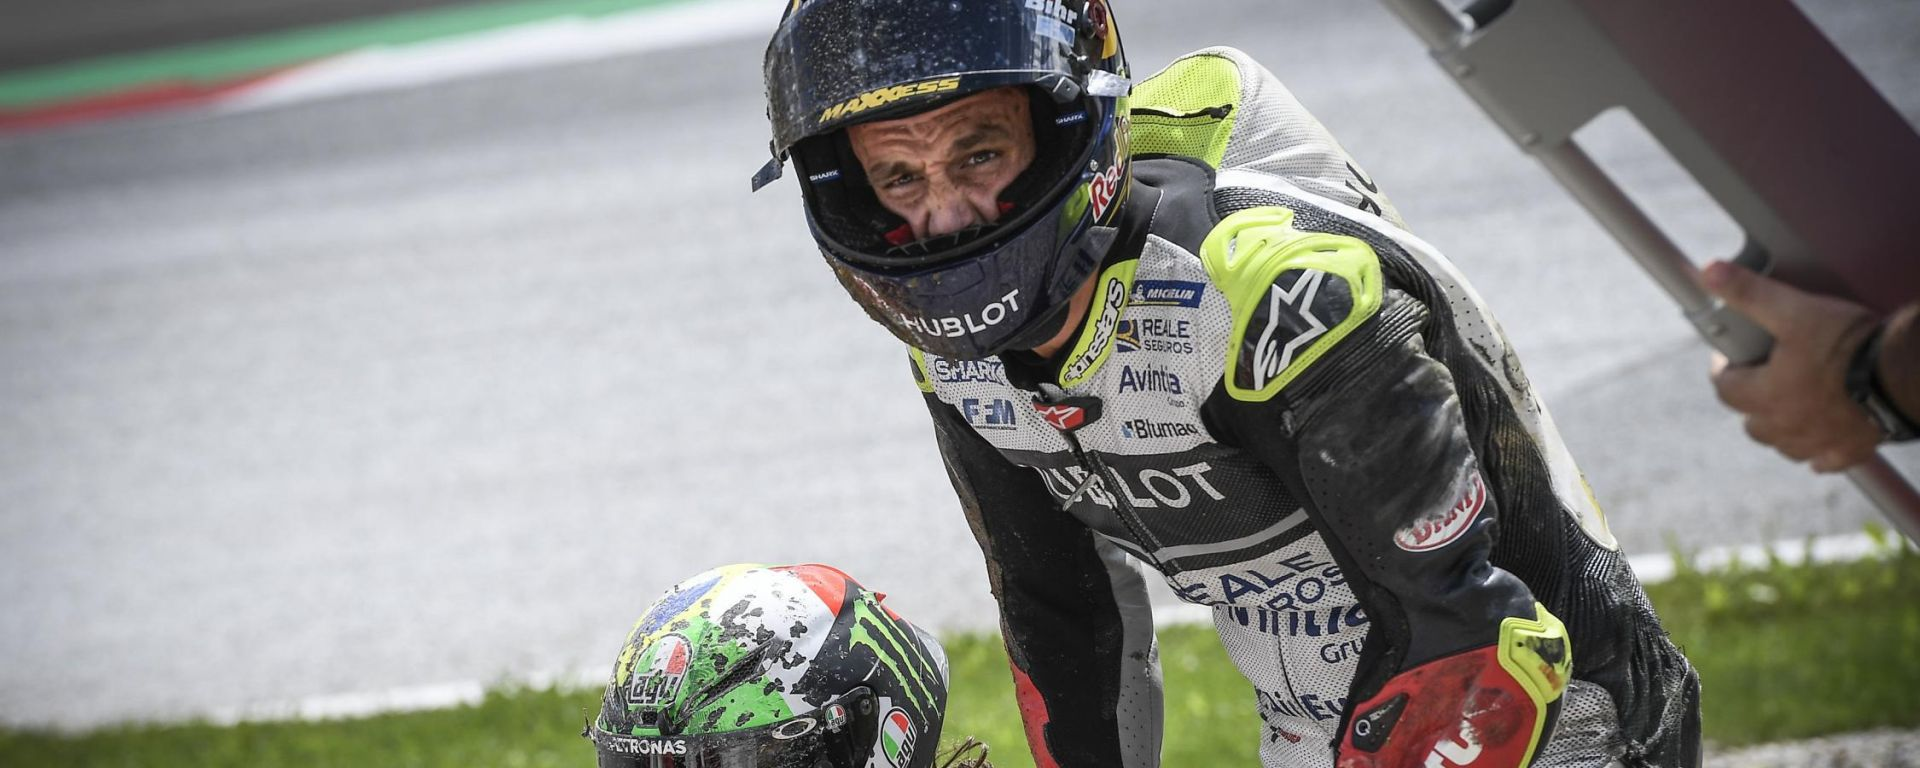 MotoGP Austria 2020, Spielberg: Franco Morbidelli (Yamaha) e Johann Zarco (Ducati) dopo l'incidente